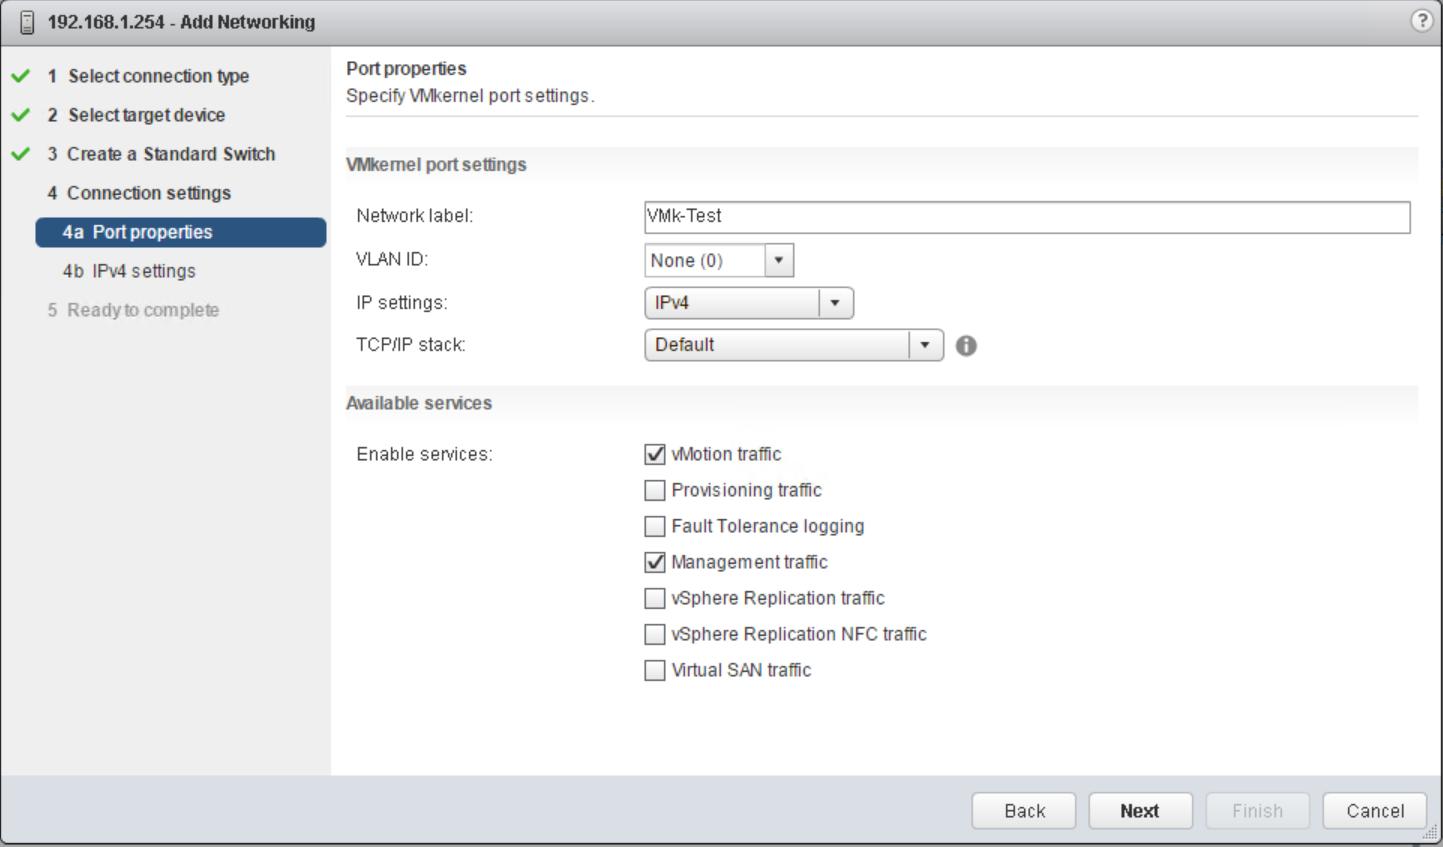 domalab.com vSphere Standard Switches port properties